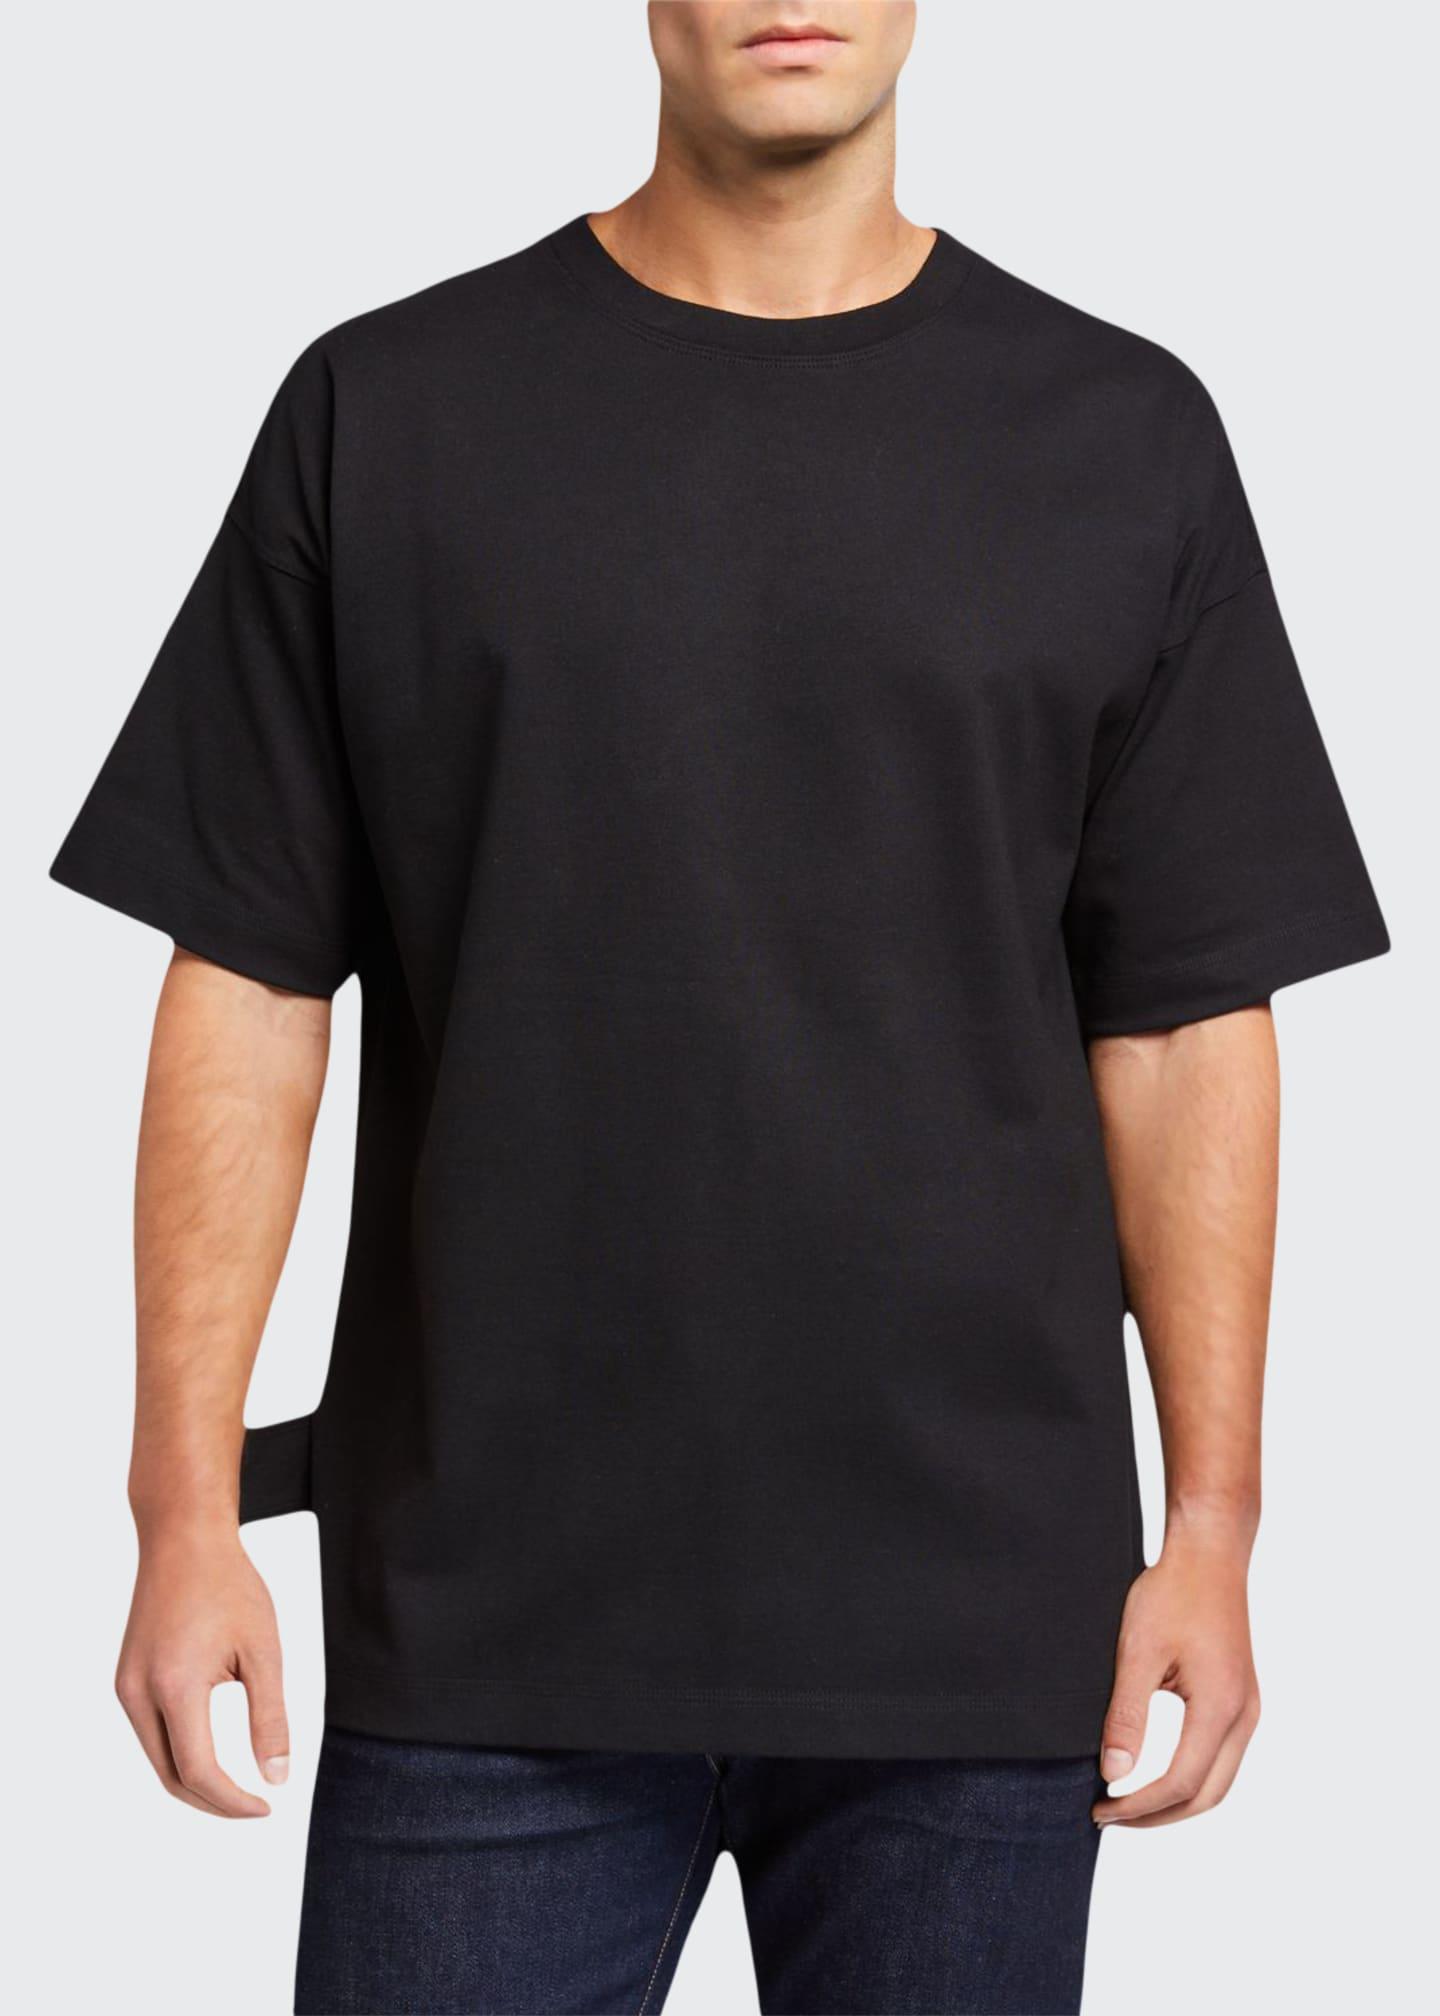 Bottega Veneta Men's Heavyweight Dropped-Shoulder T-Shirt